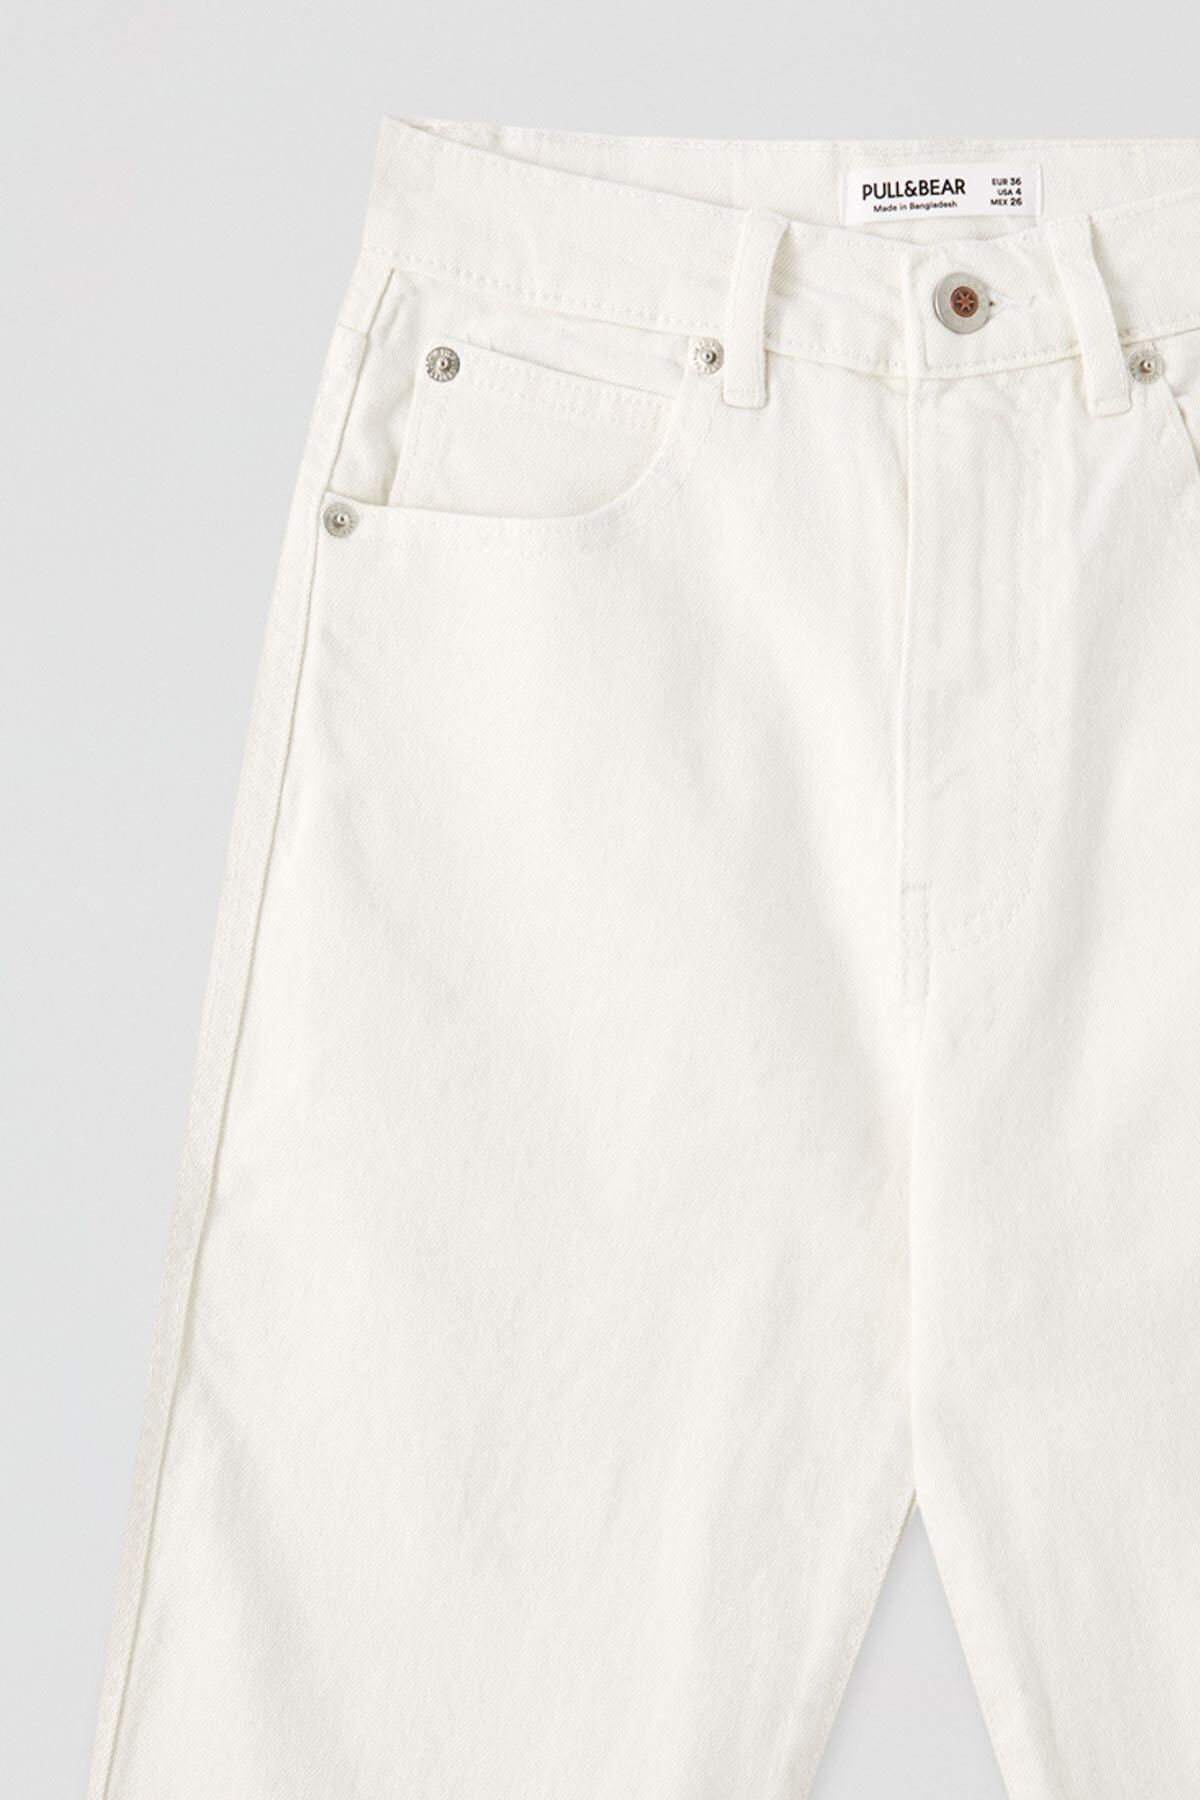 Pull & Bear Kadın Beyaz Comfort Slim Fit Mom Jean 05682305 2